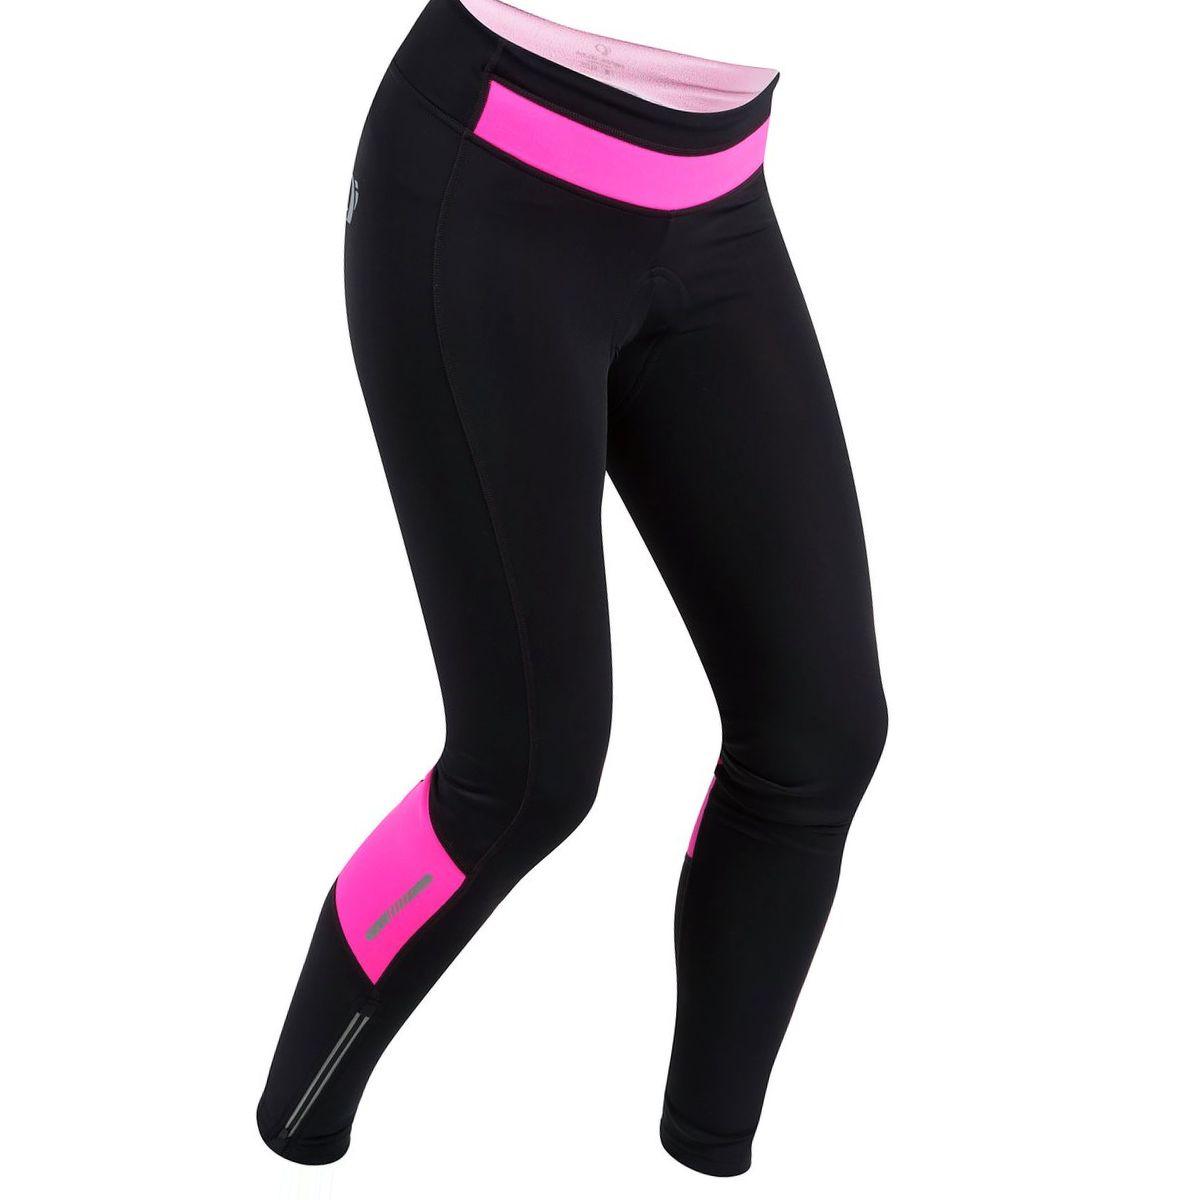 Pearl Izumi Elite Cycling Thermal Tight - Women's